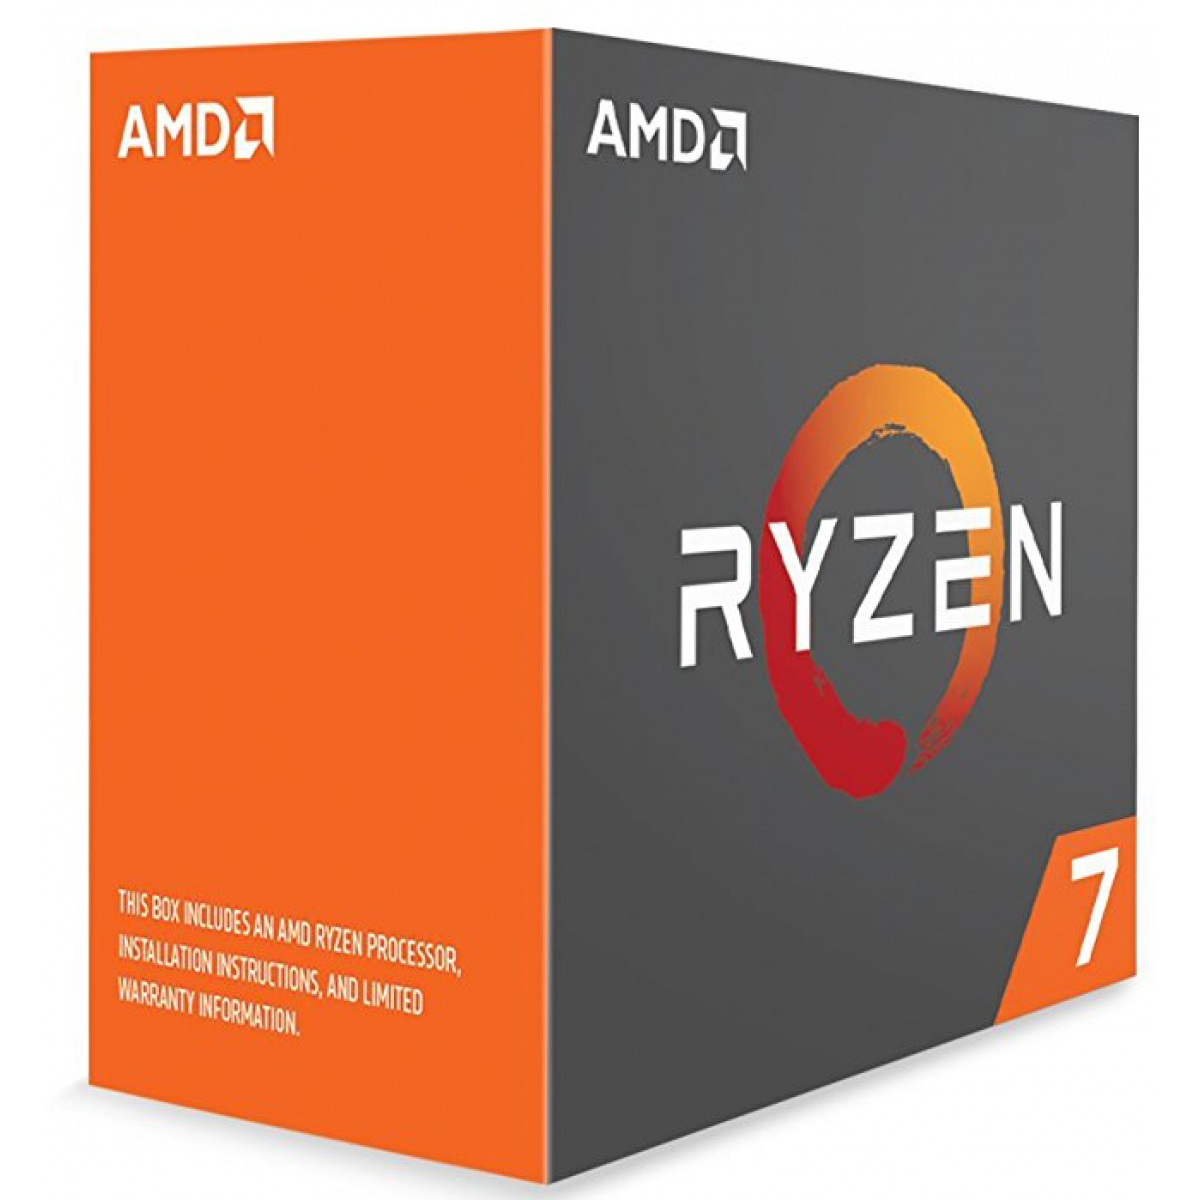 Processador AMD Ryzen 7 1800X 3.6Ghz (4.0GHz Turbo), 8-Core 16-Thread, S/Cooler, AM4, YD180XBCAEWOF, S/ Video